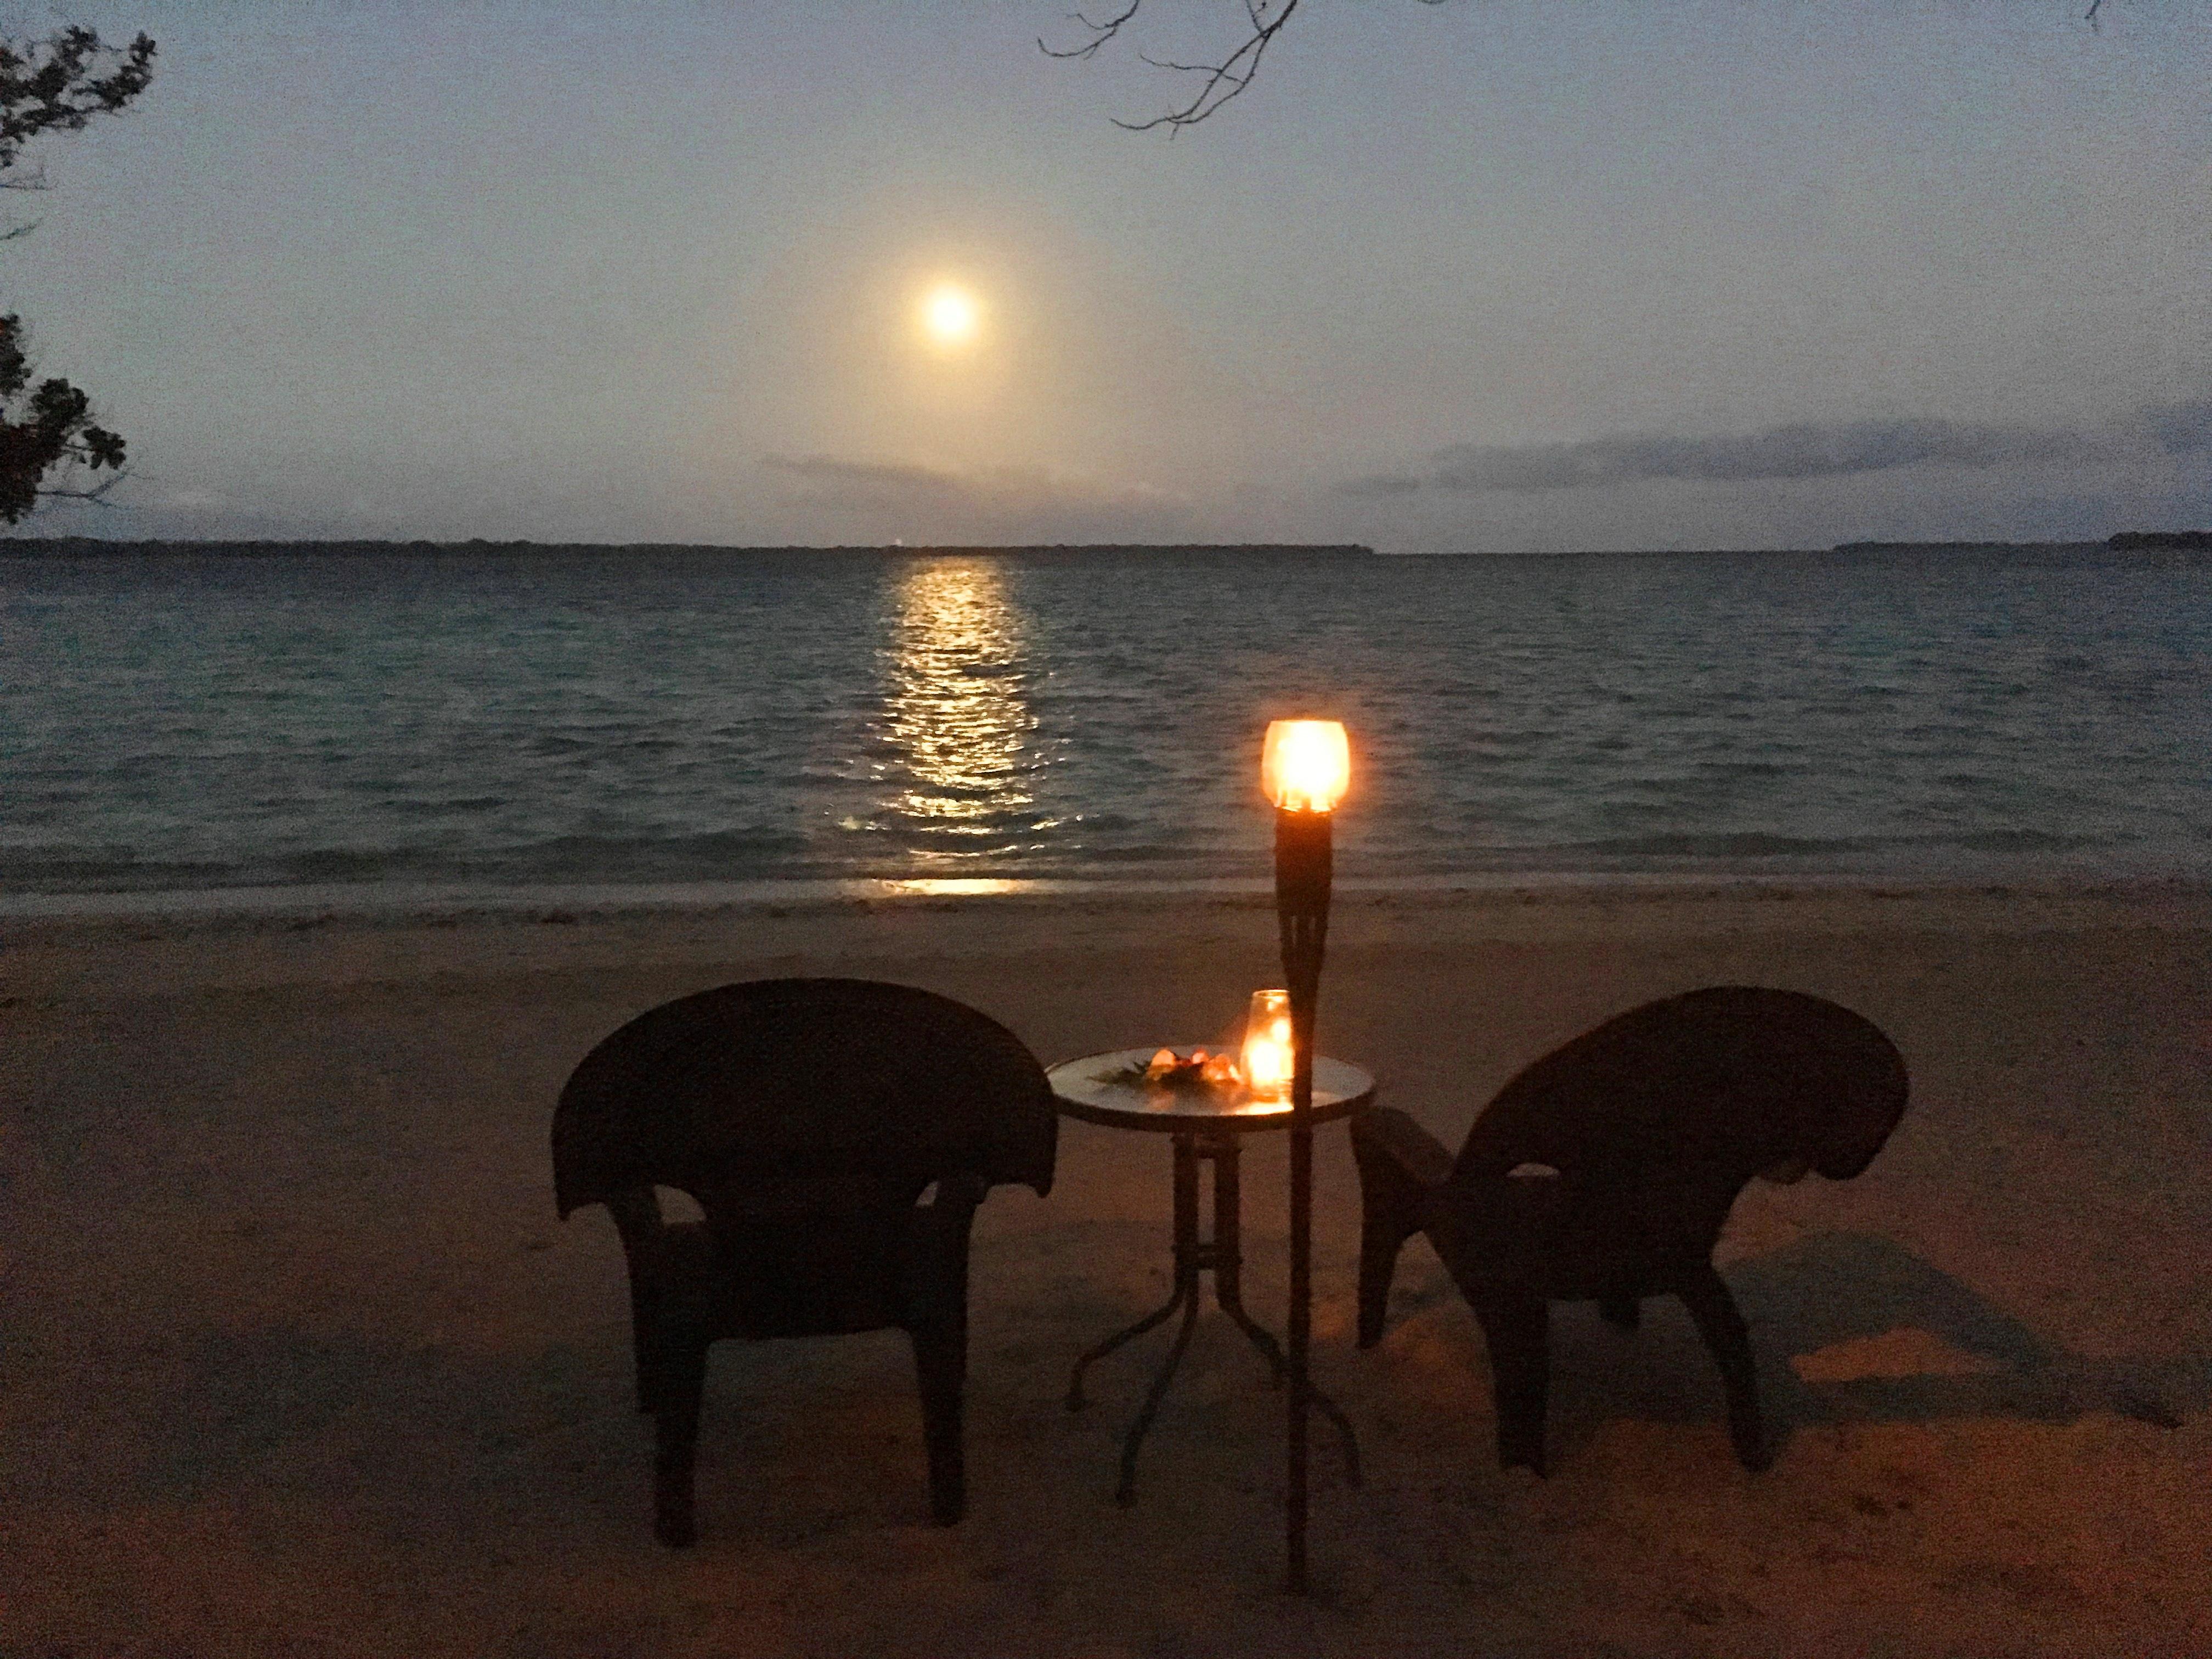 Romantic Dinners, moonlight, firelig